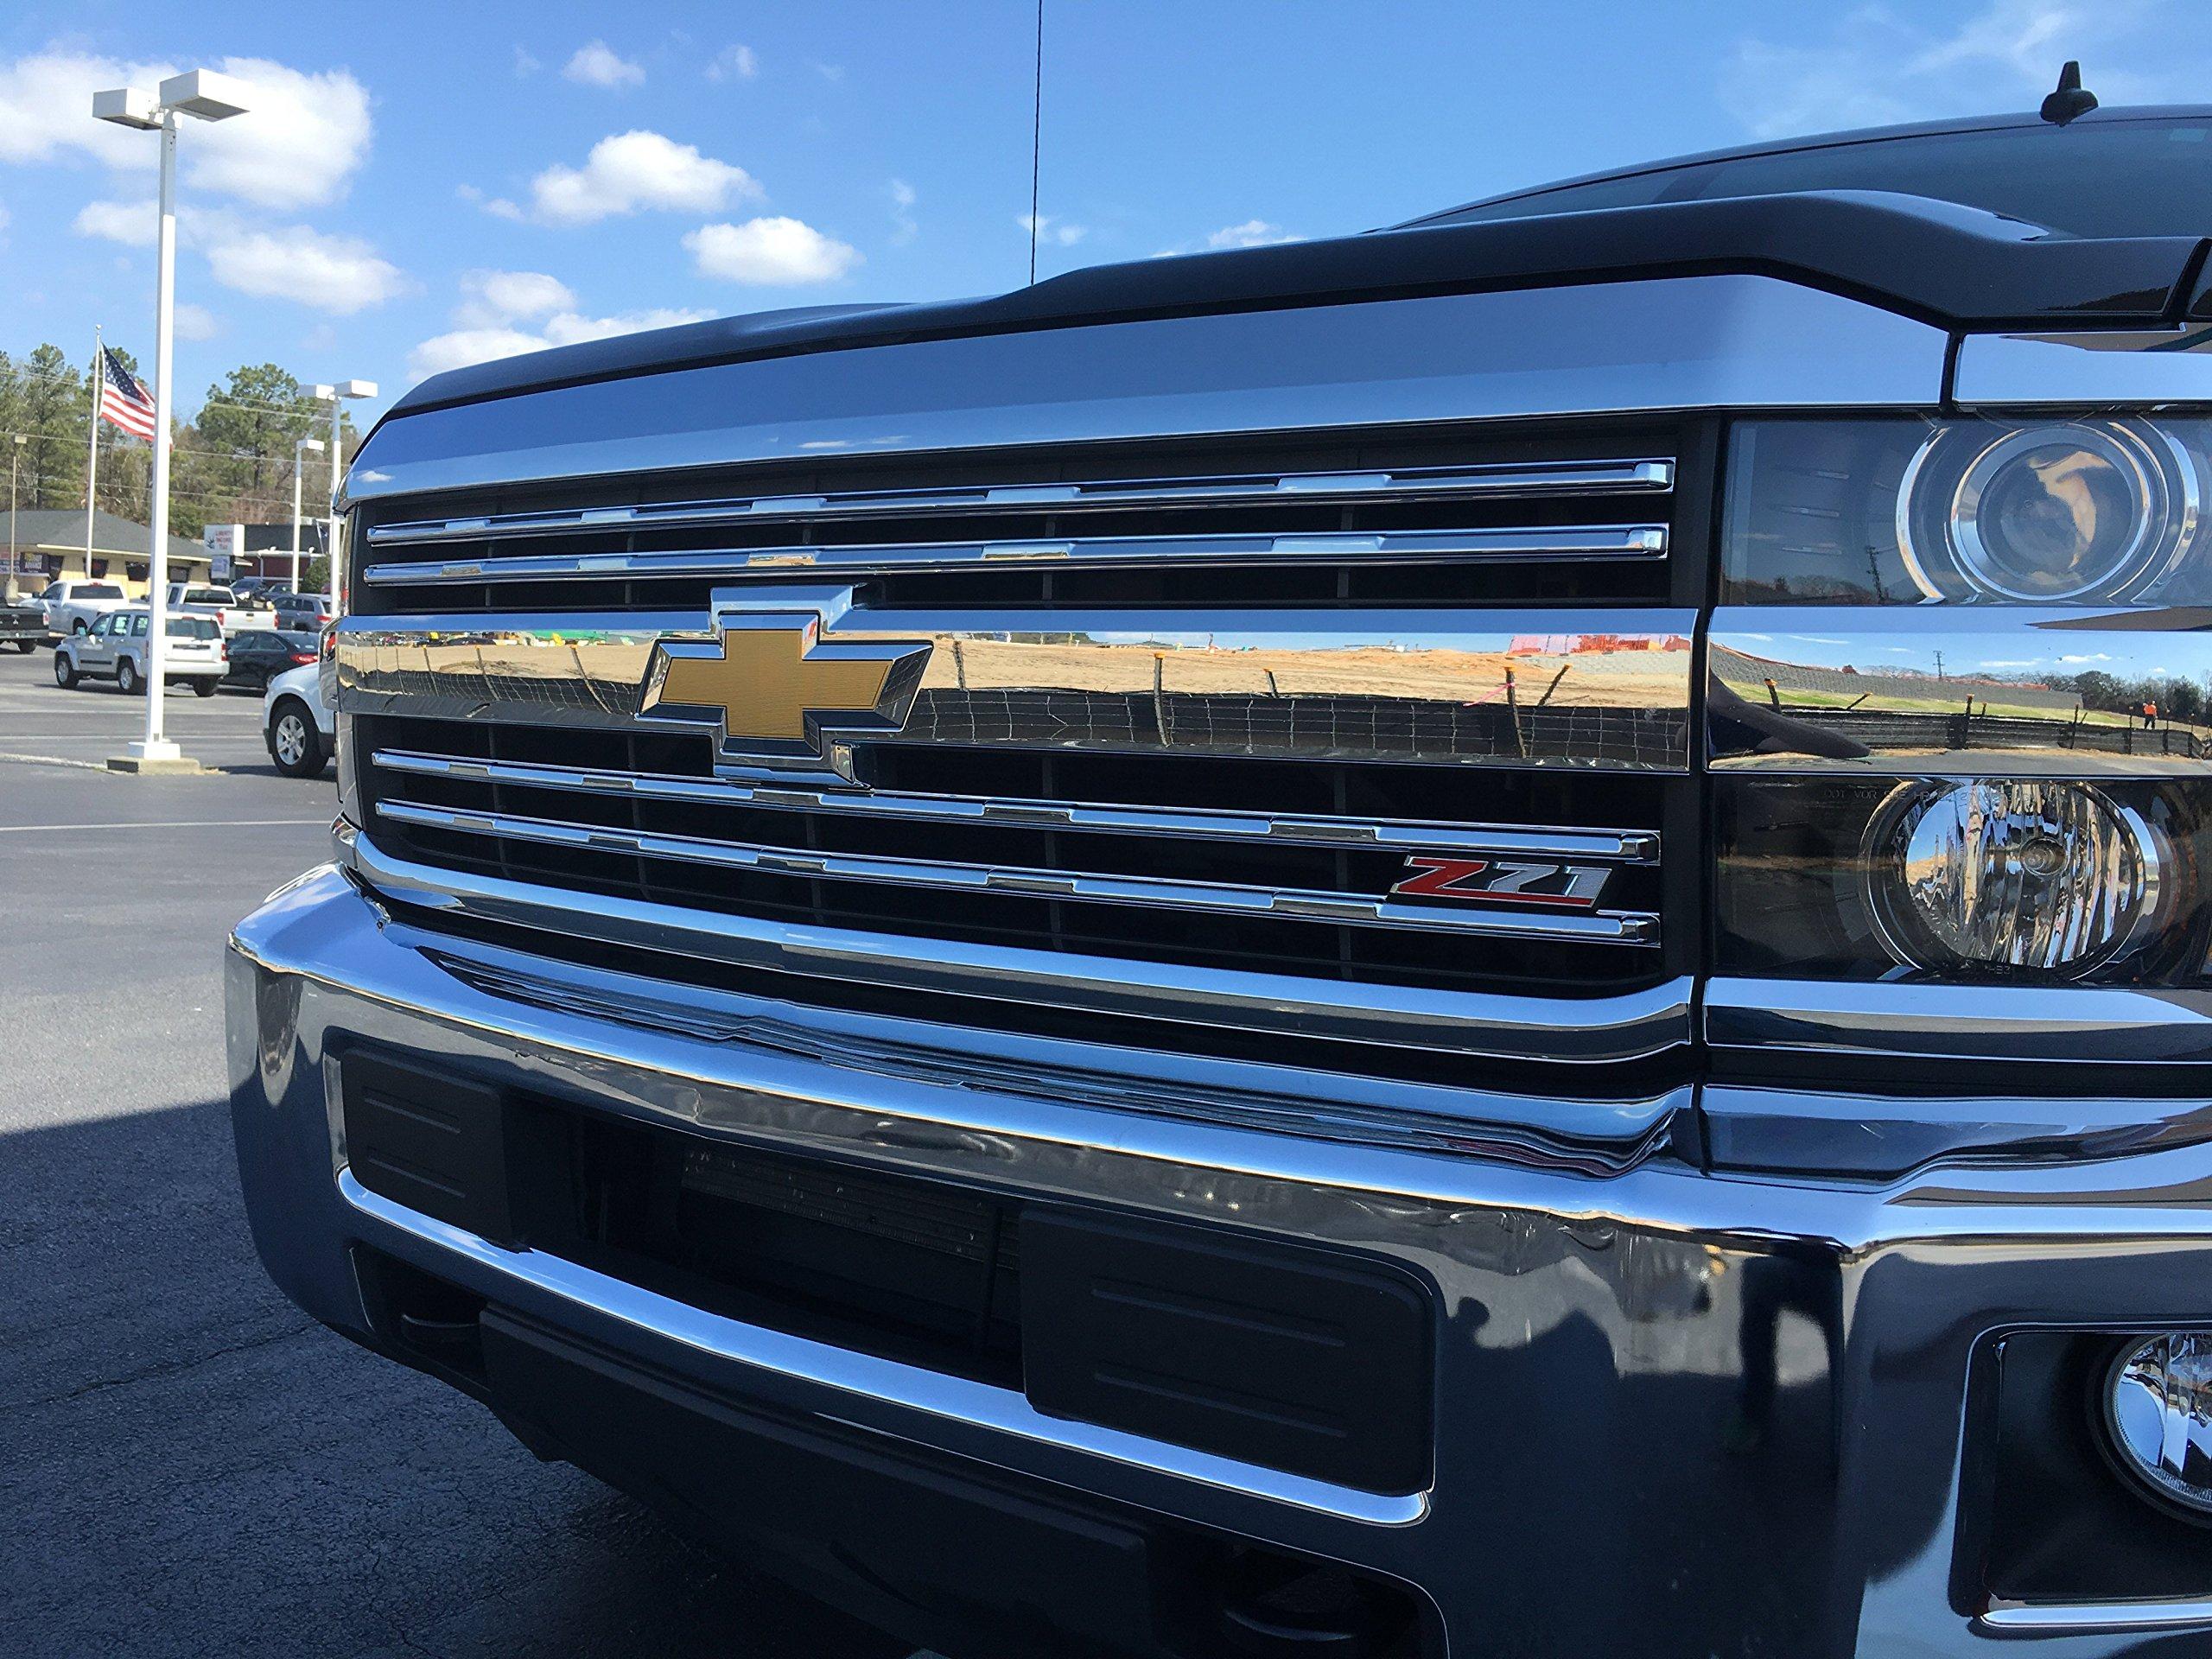 Chrome Grille Overlay Insert for 2015-2016 Chevy Silverado 2500, 3500, Z71